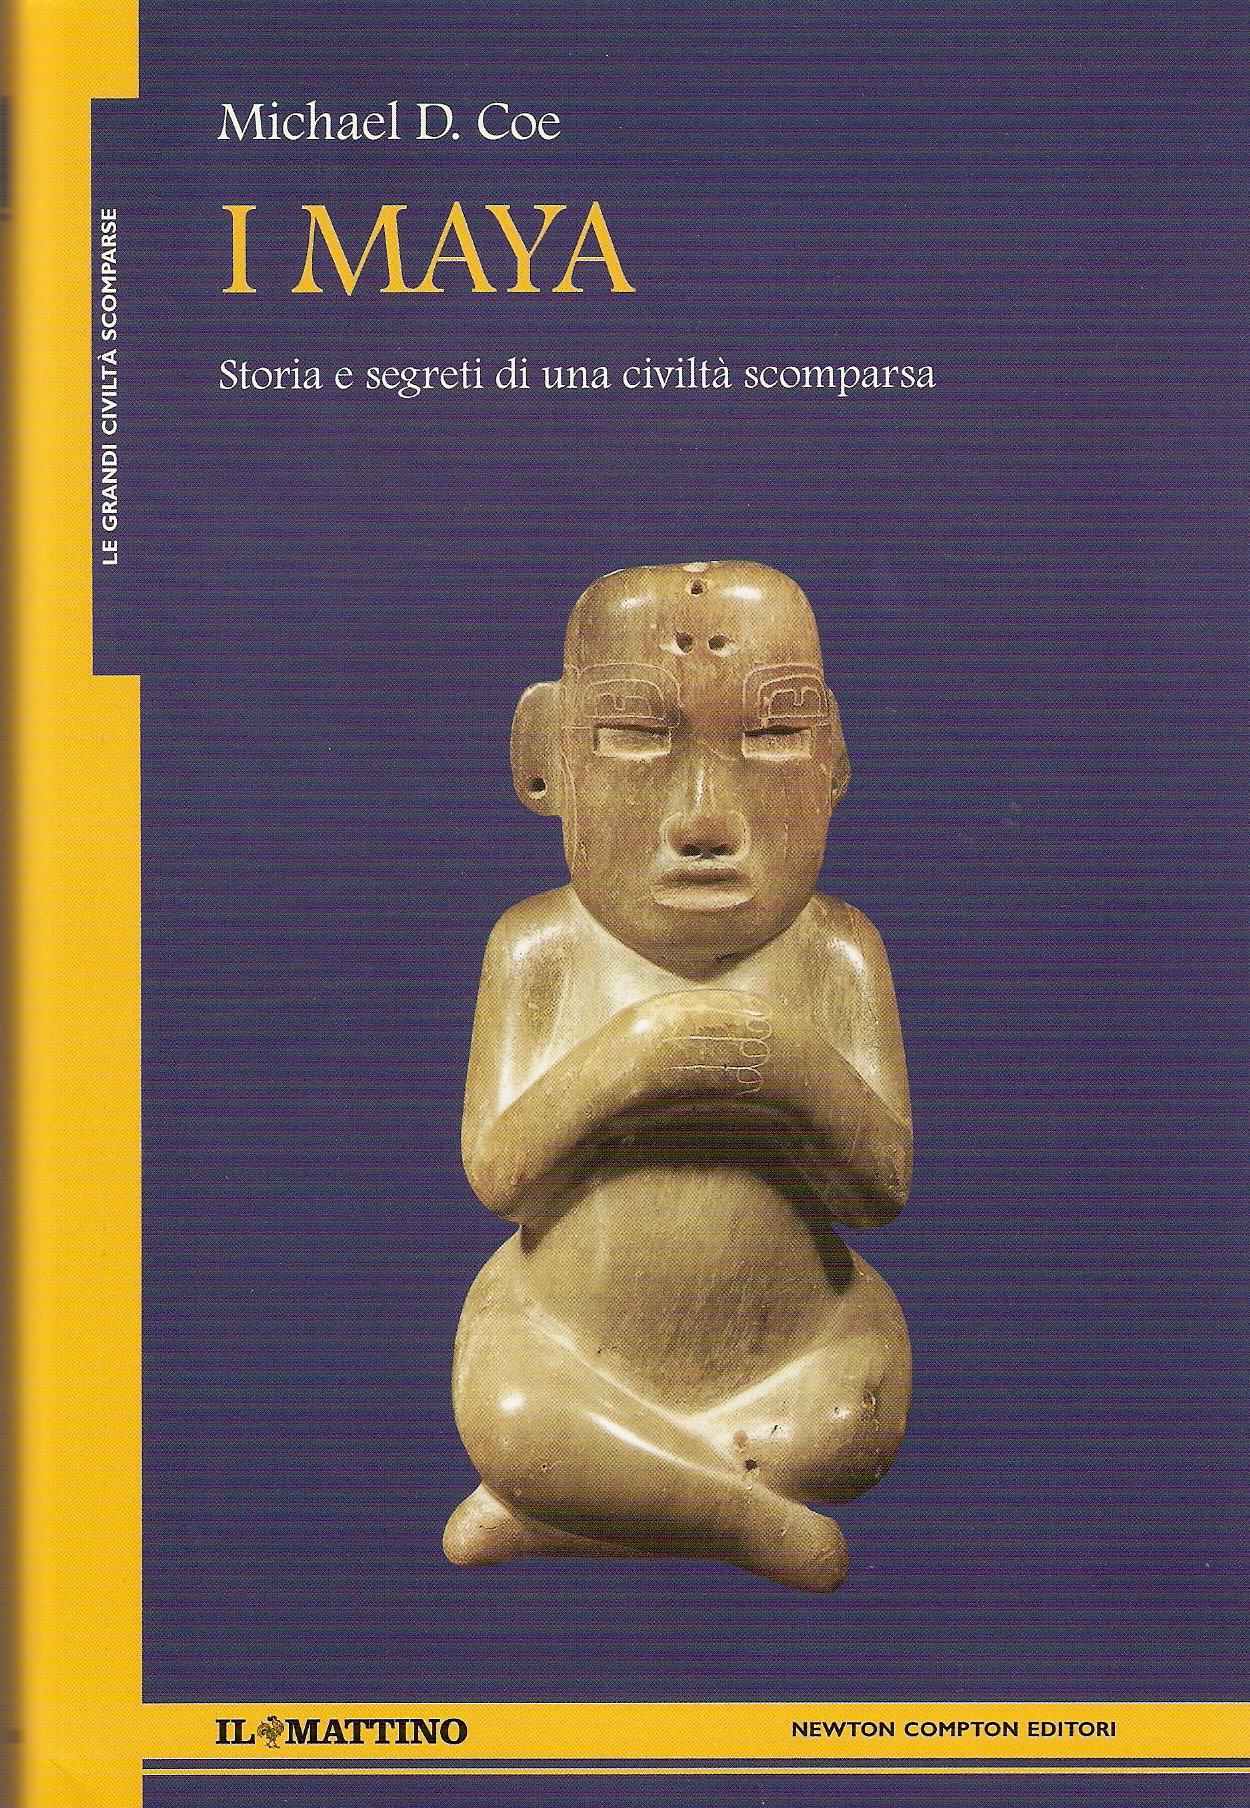 Risultati immagini per i maya michael d. coe newton & compton